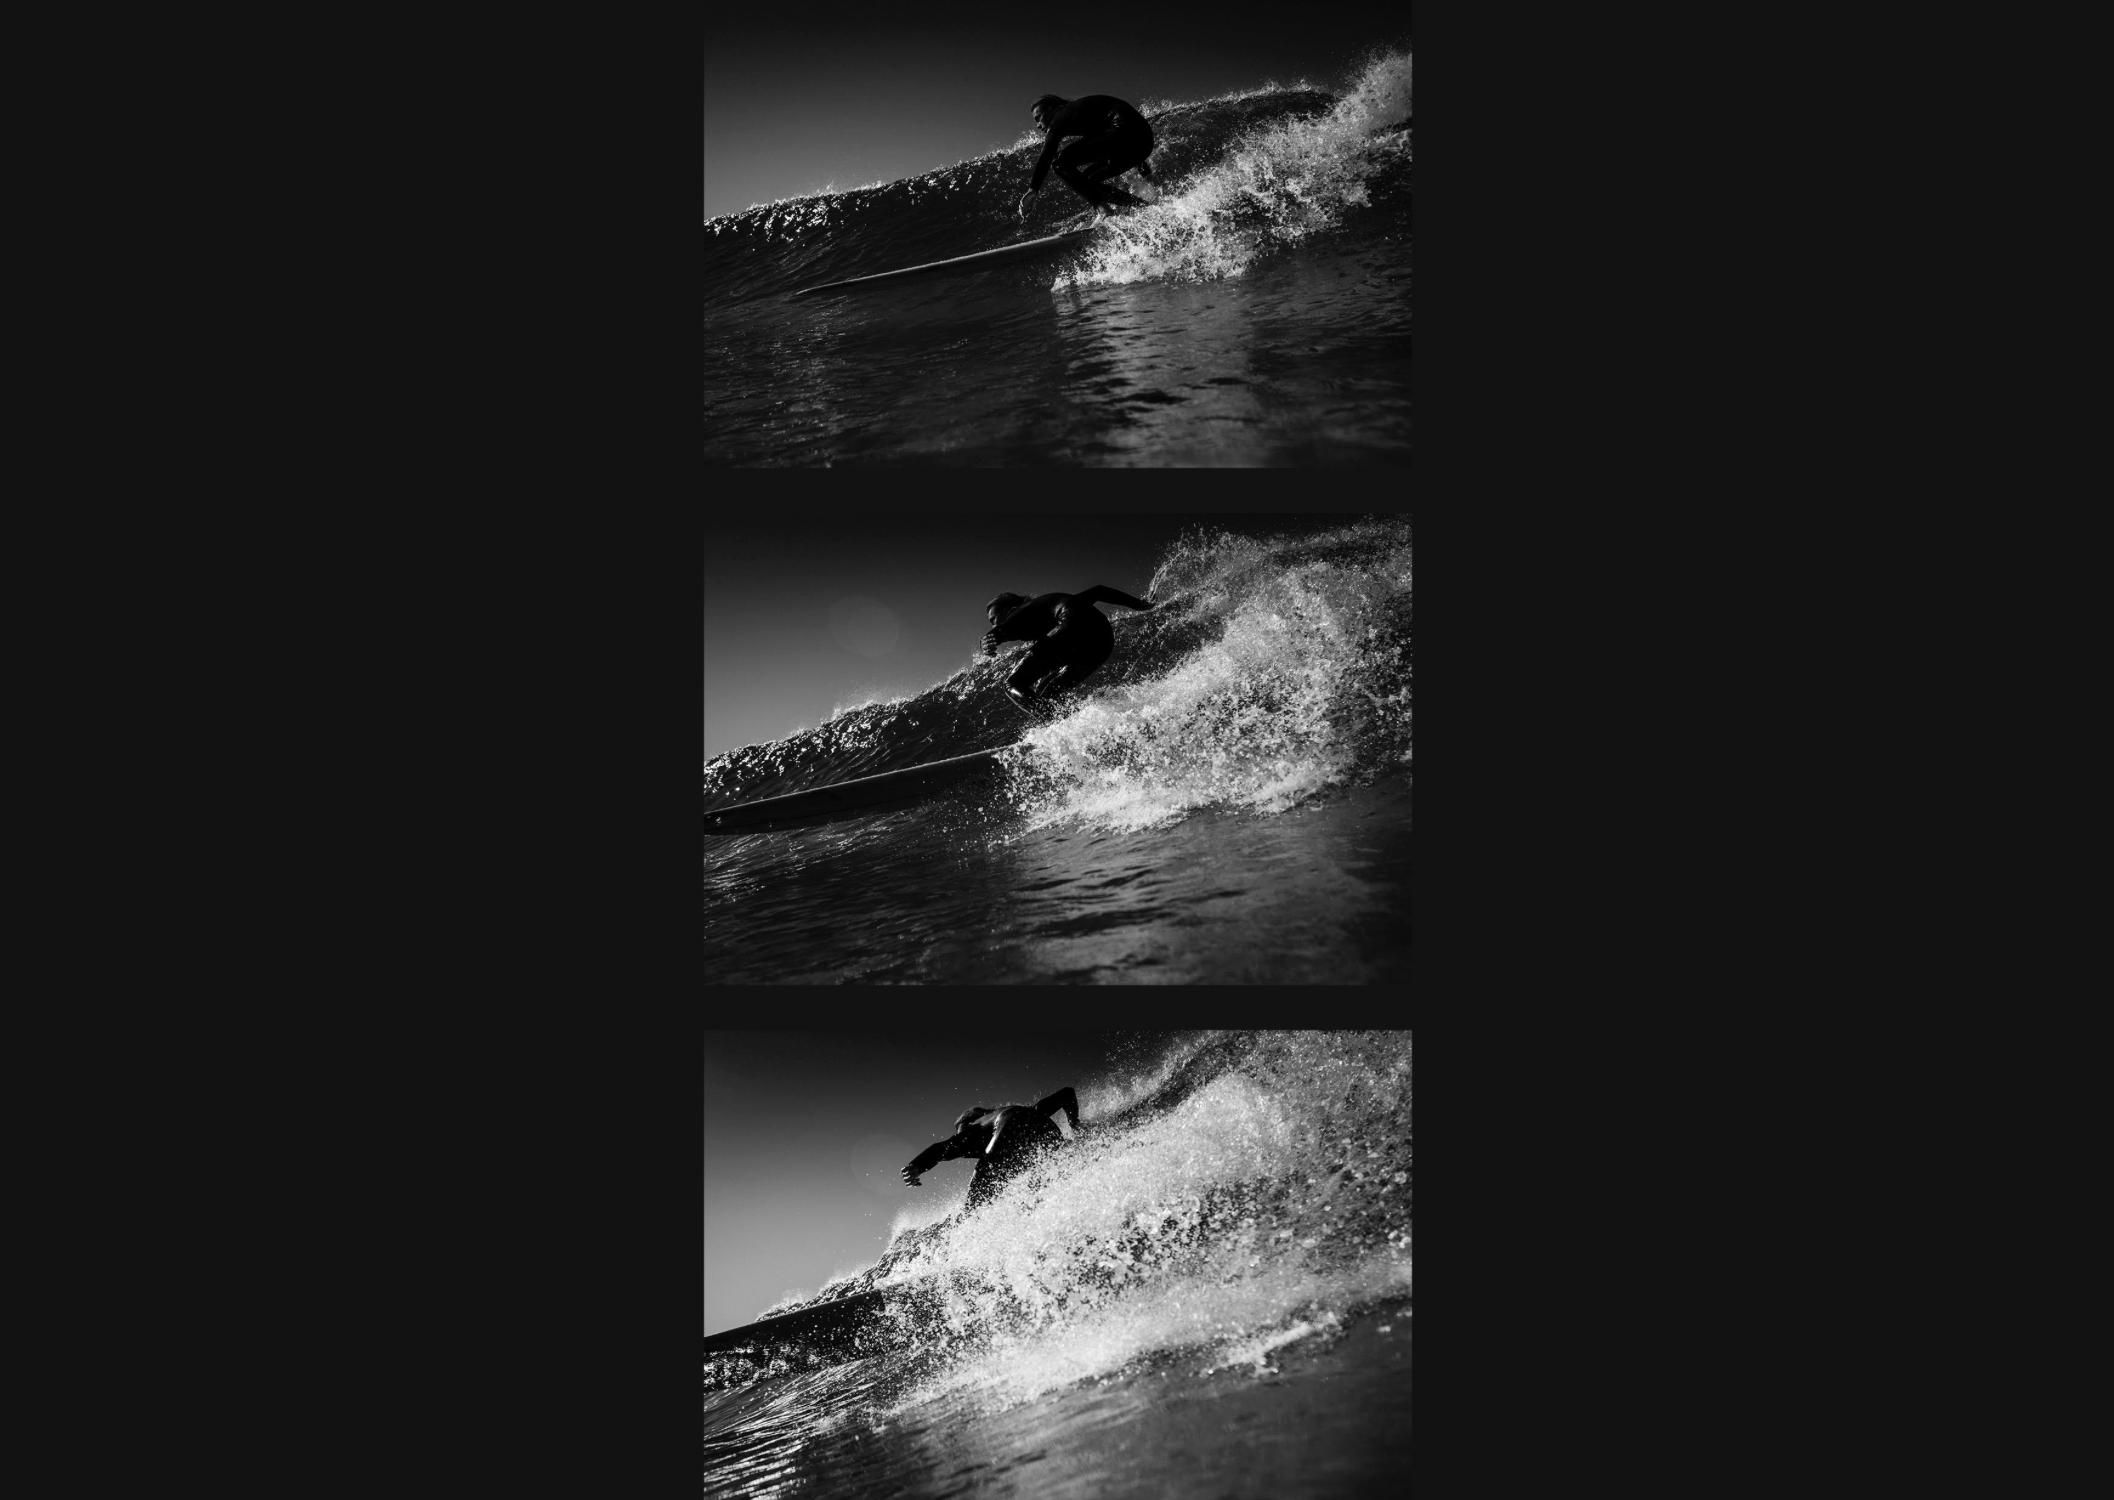 saltwater x fabien voileau x Jye Whyatt 20